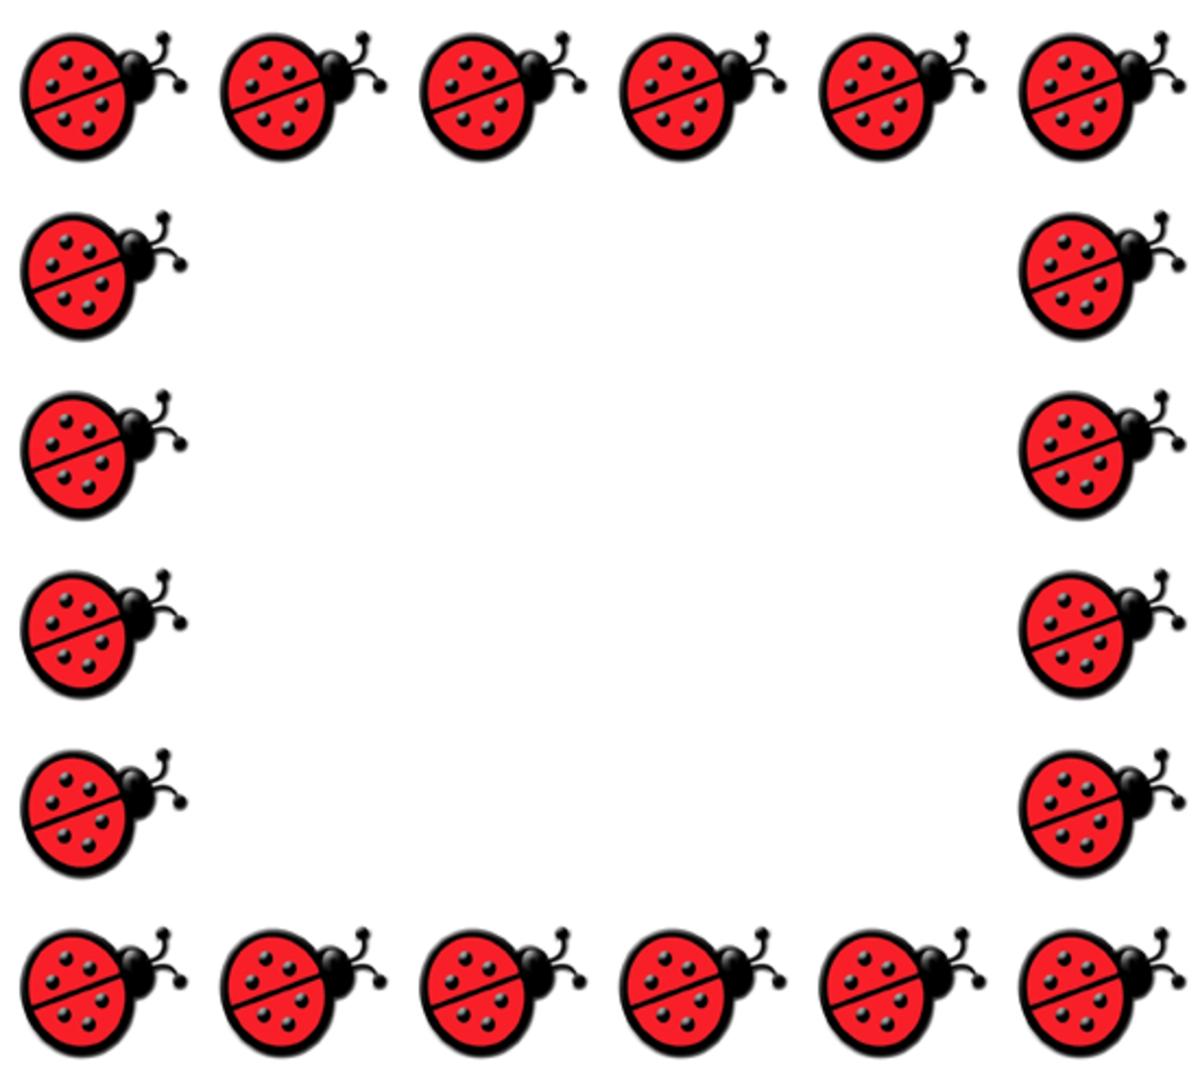 Ladybug Clip Art Frame